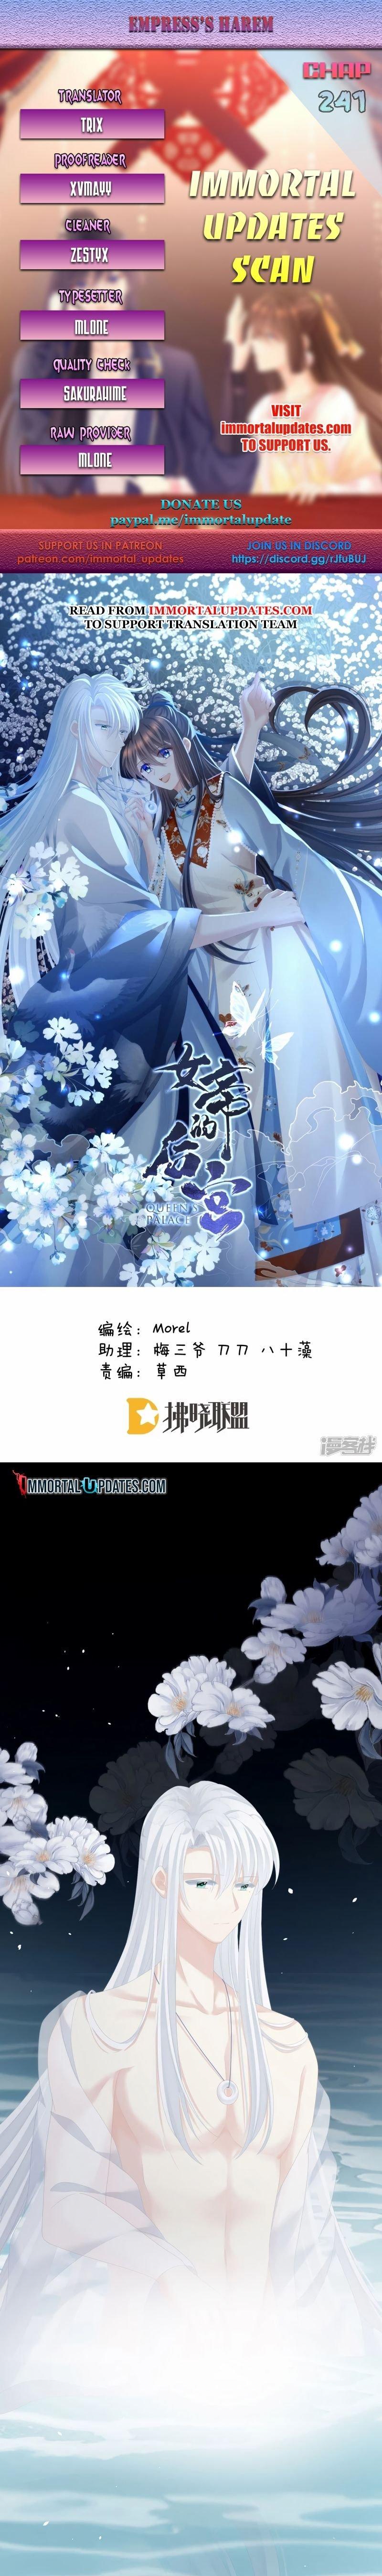 Manga Empress's Harem - Chapter 241 Page 1